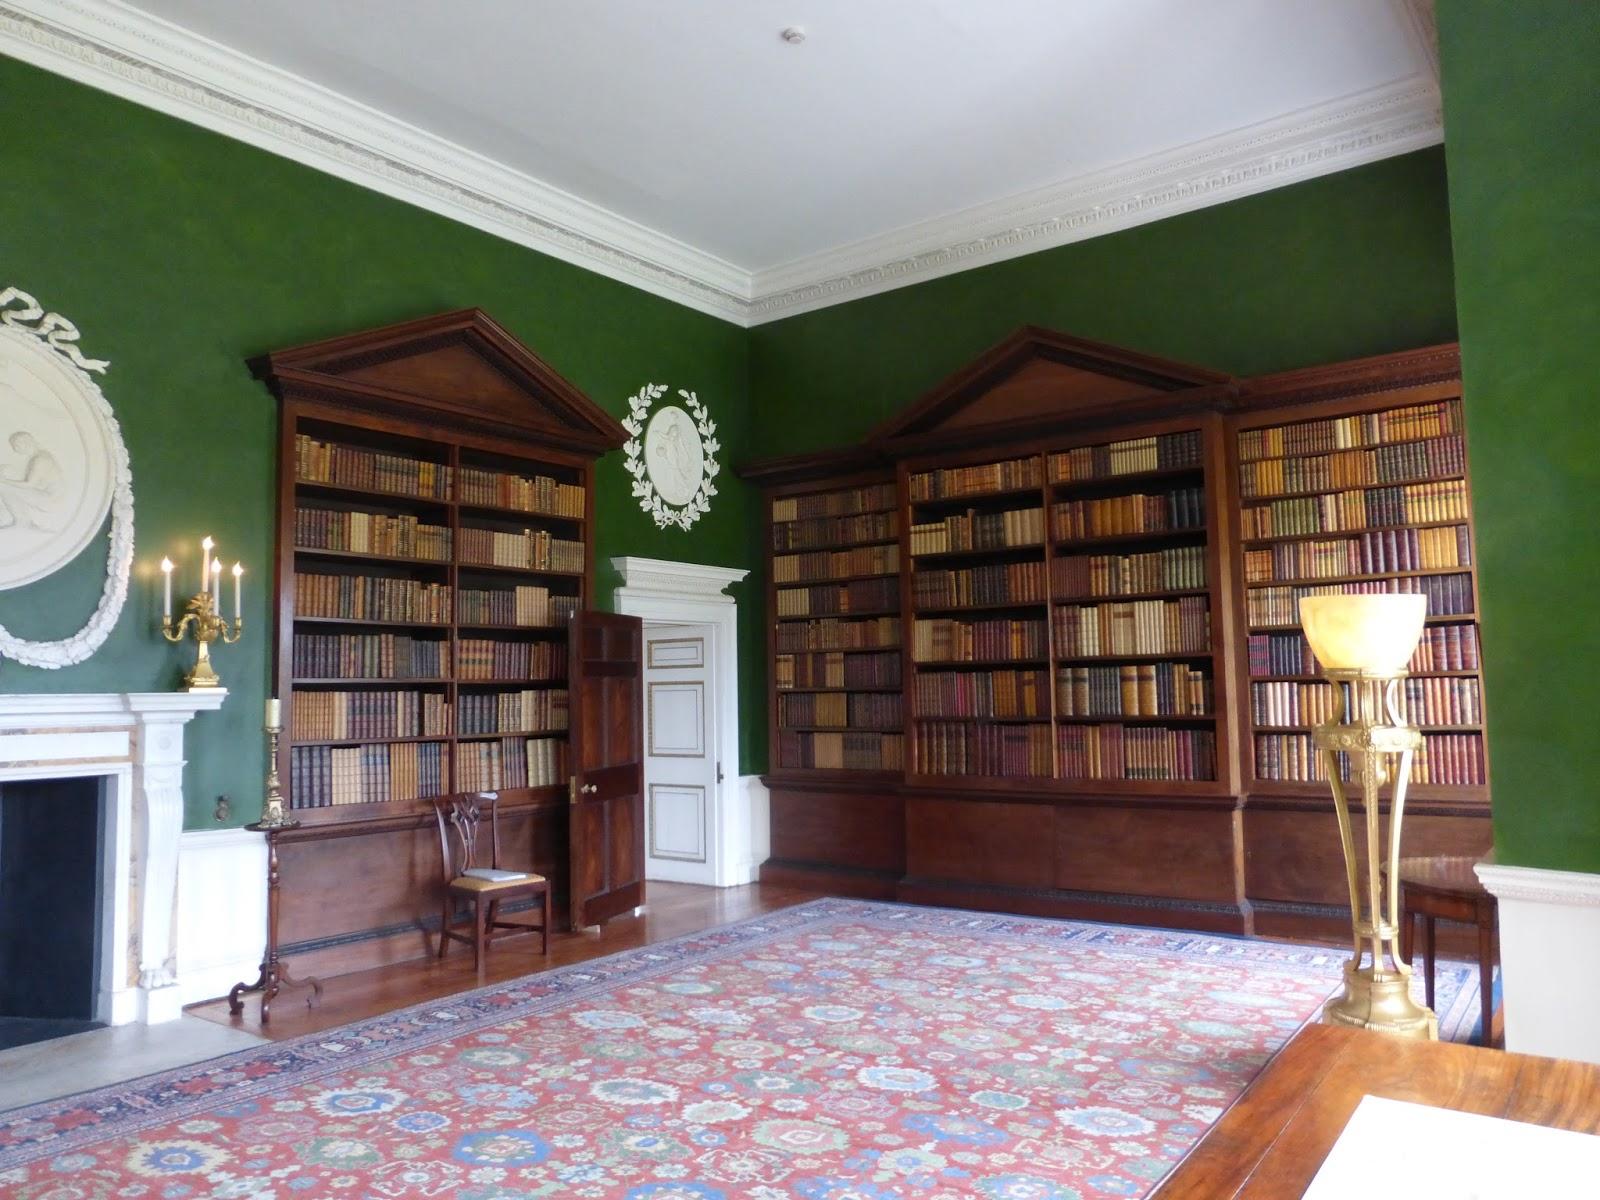 Danson House Library Room